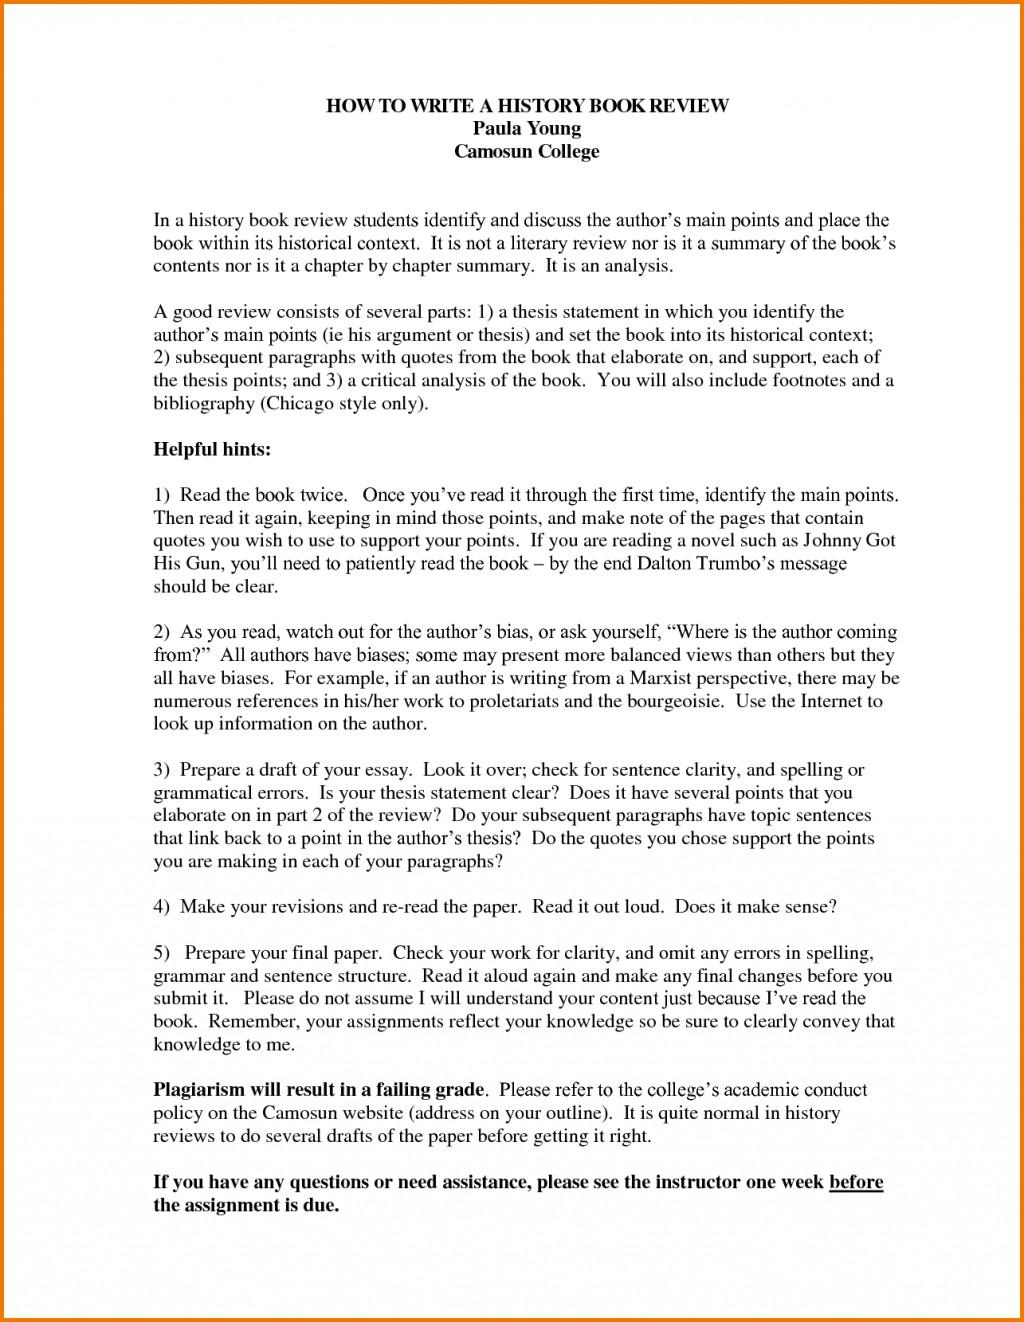 006 American Dream Argumentative Essay Marvelous Examples Topics Argument Prompt Large